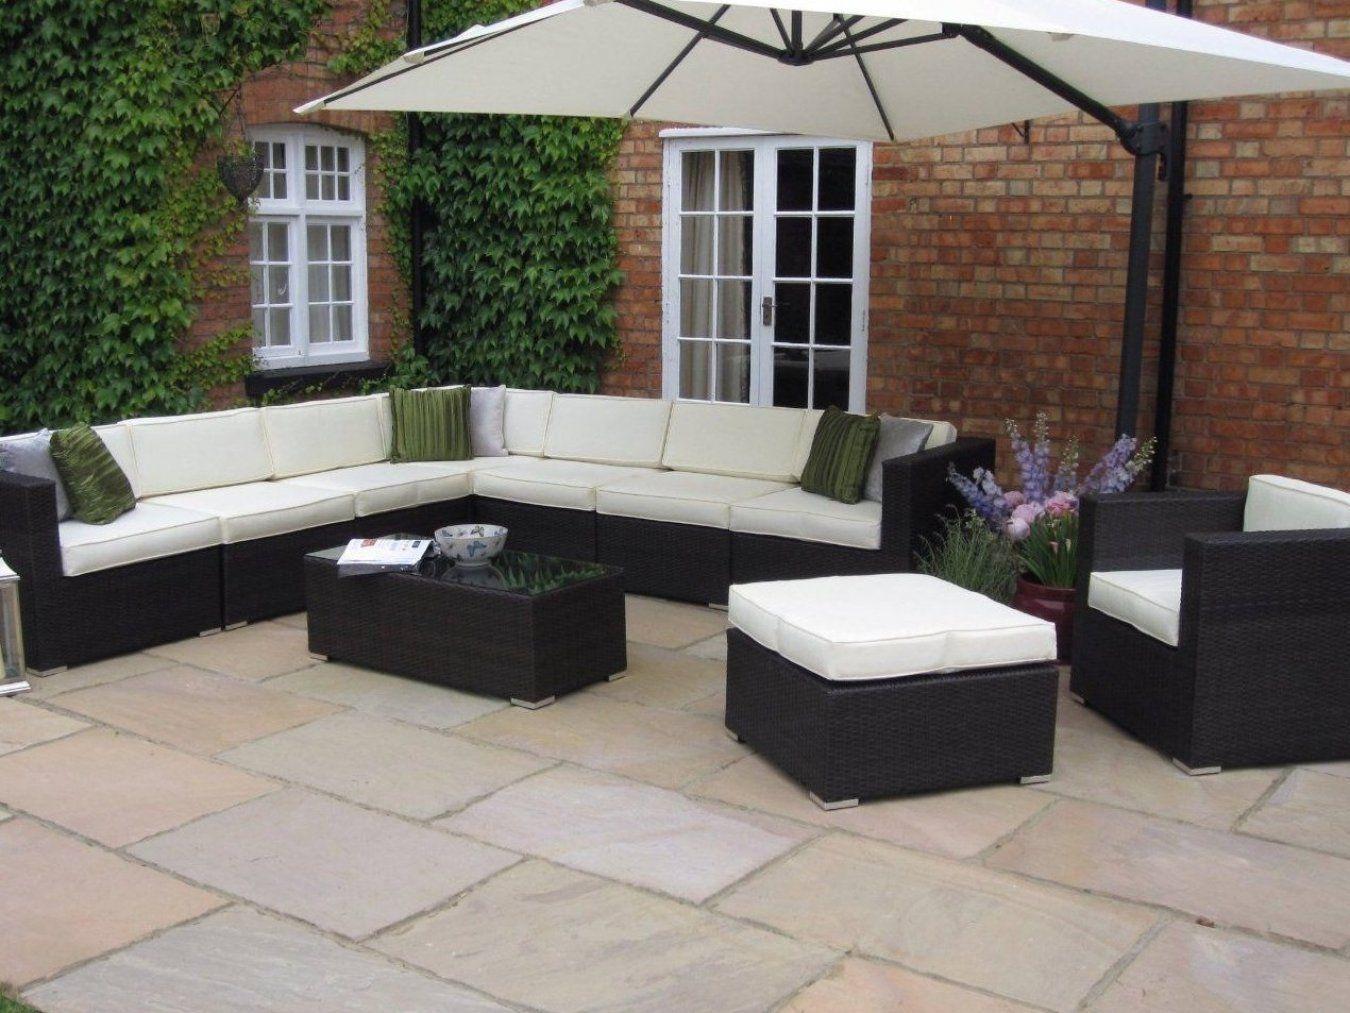 Oakita Rattan Garden Furniture Corner Sofa and King Parasol # in